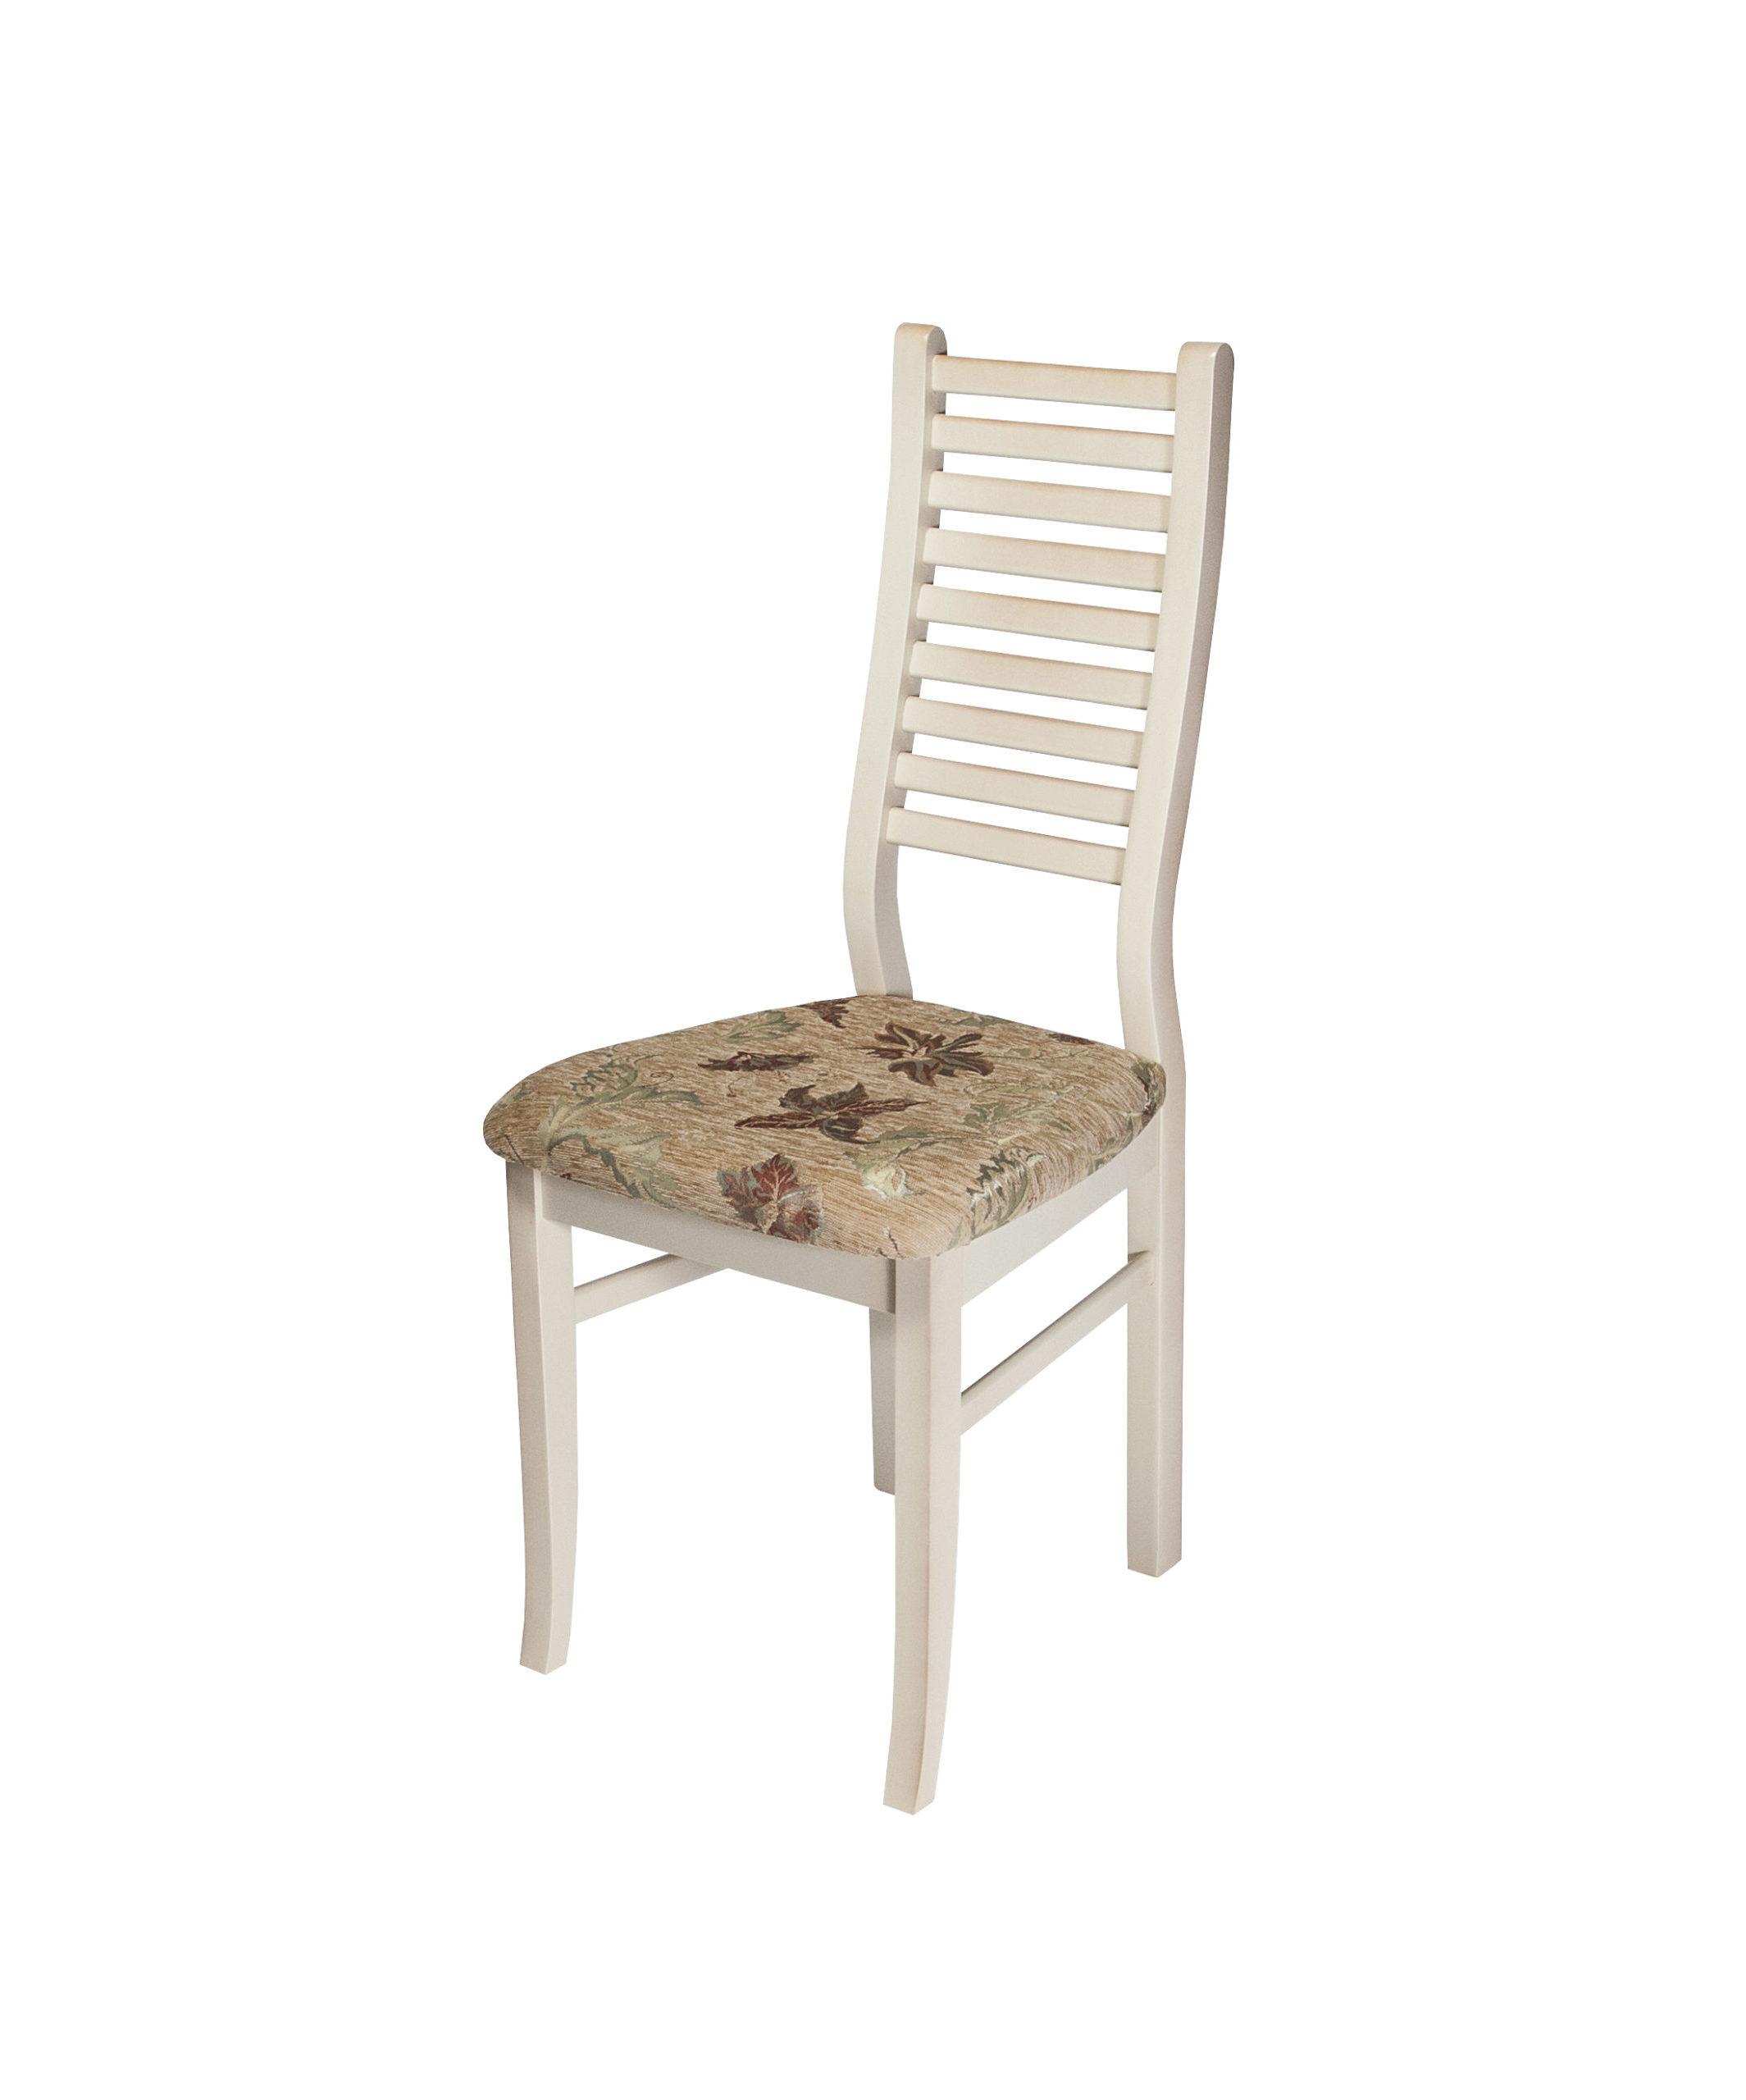 6397. Каркас стула из массива бука.